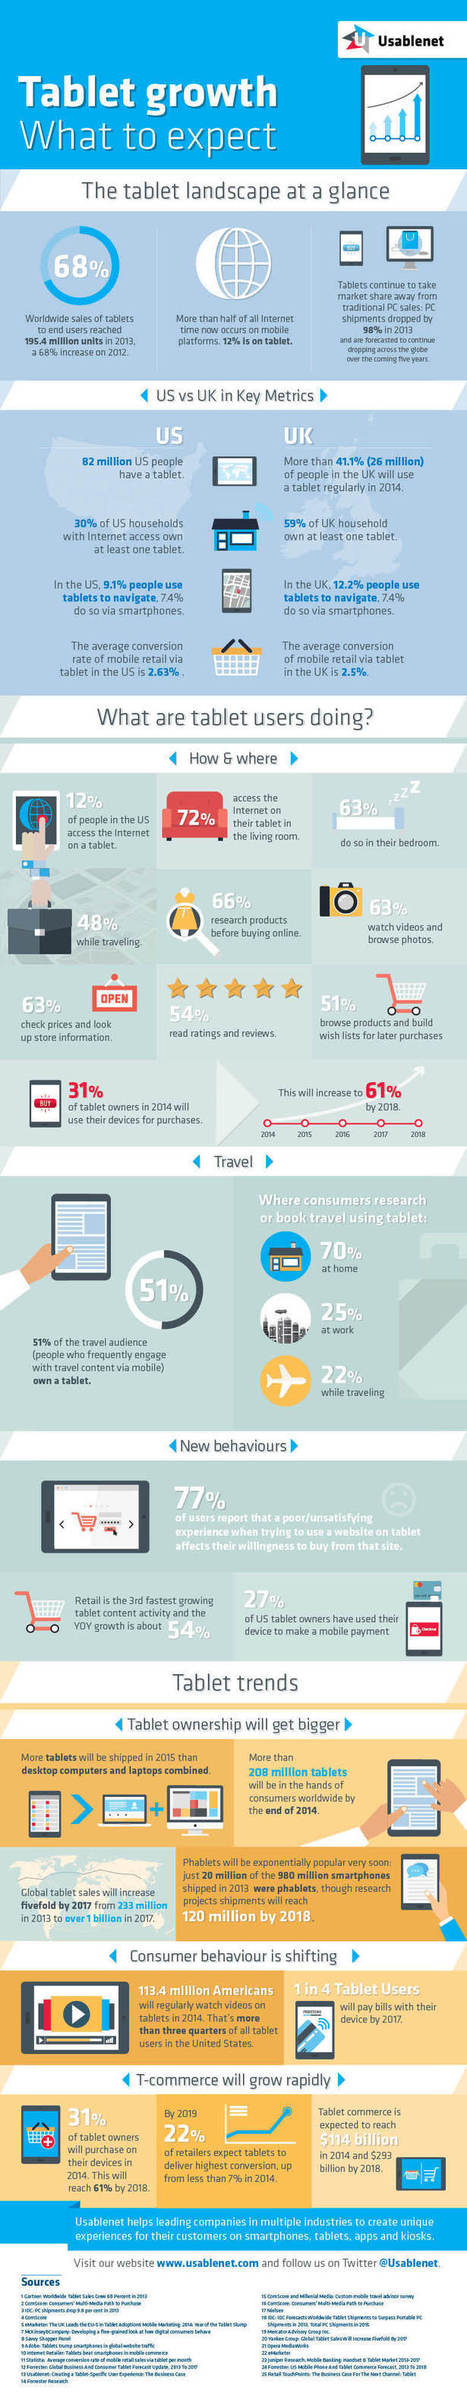 10 interesting digital marketing stats we've seen this week | corporate communication | Scoop.it